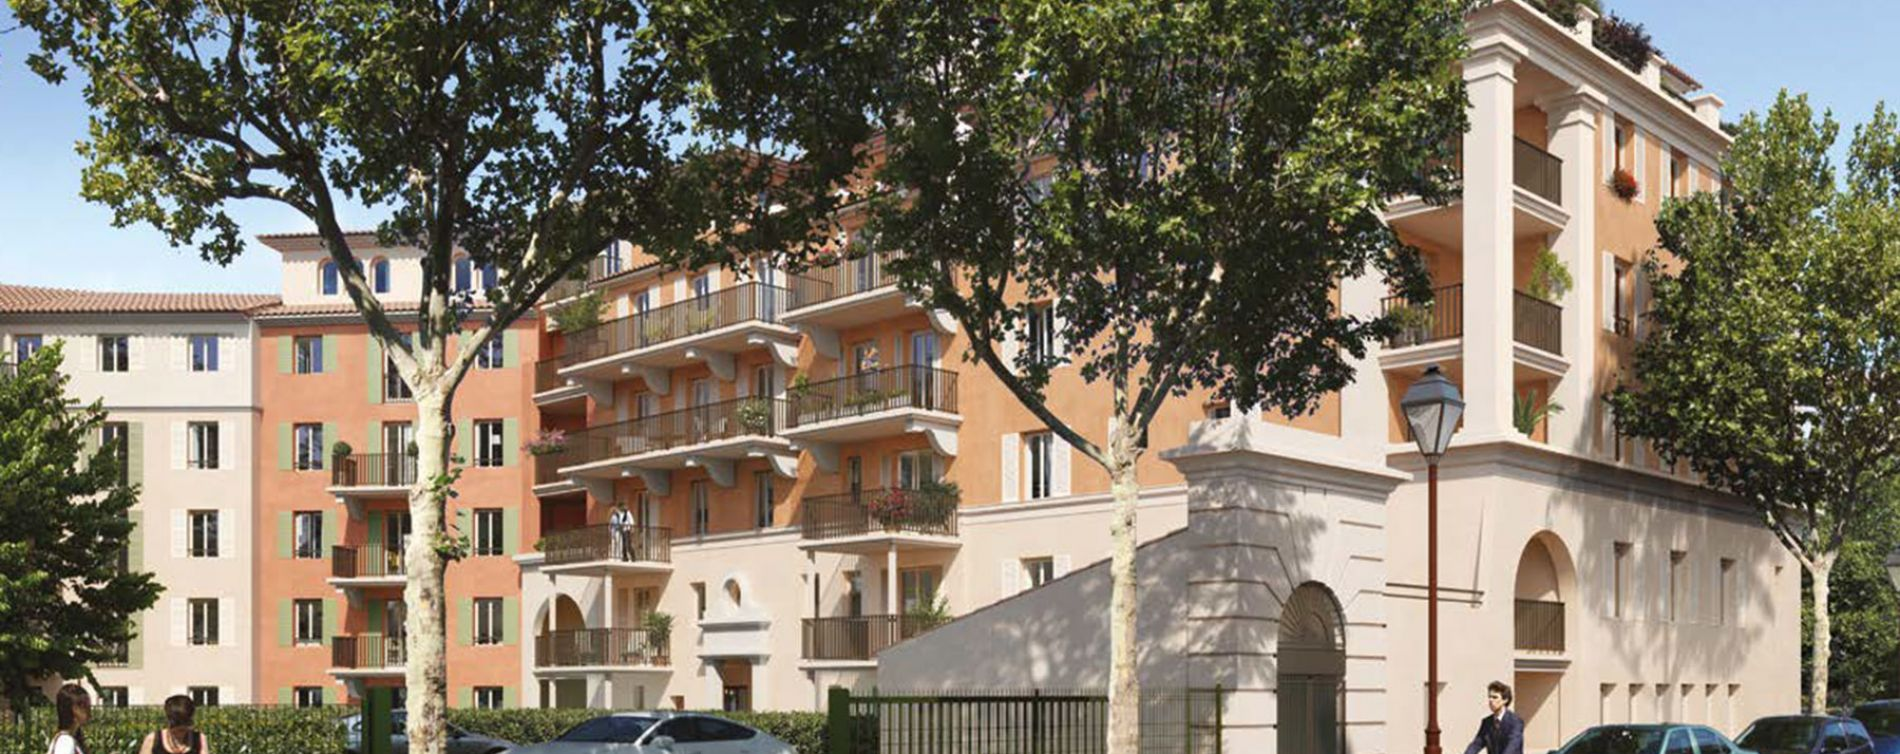 Résidence Villa Marina à Port-de-Bouc